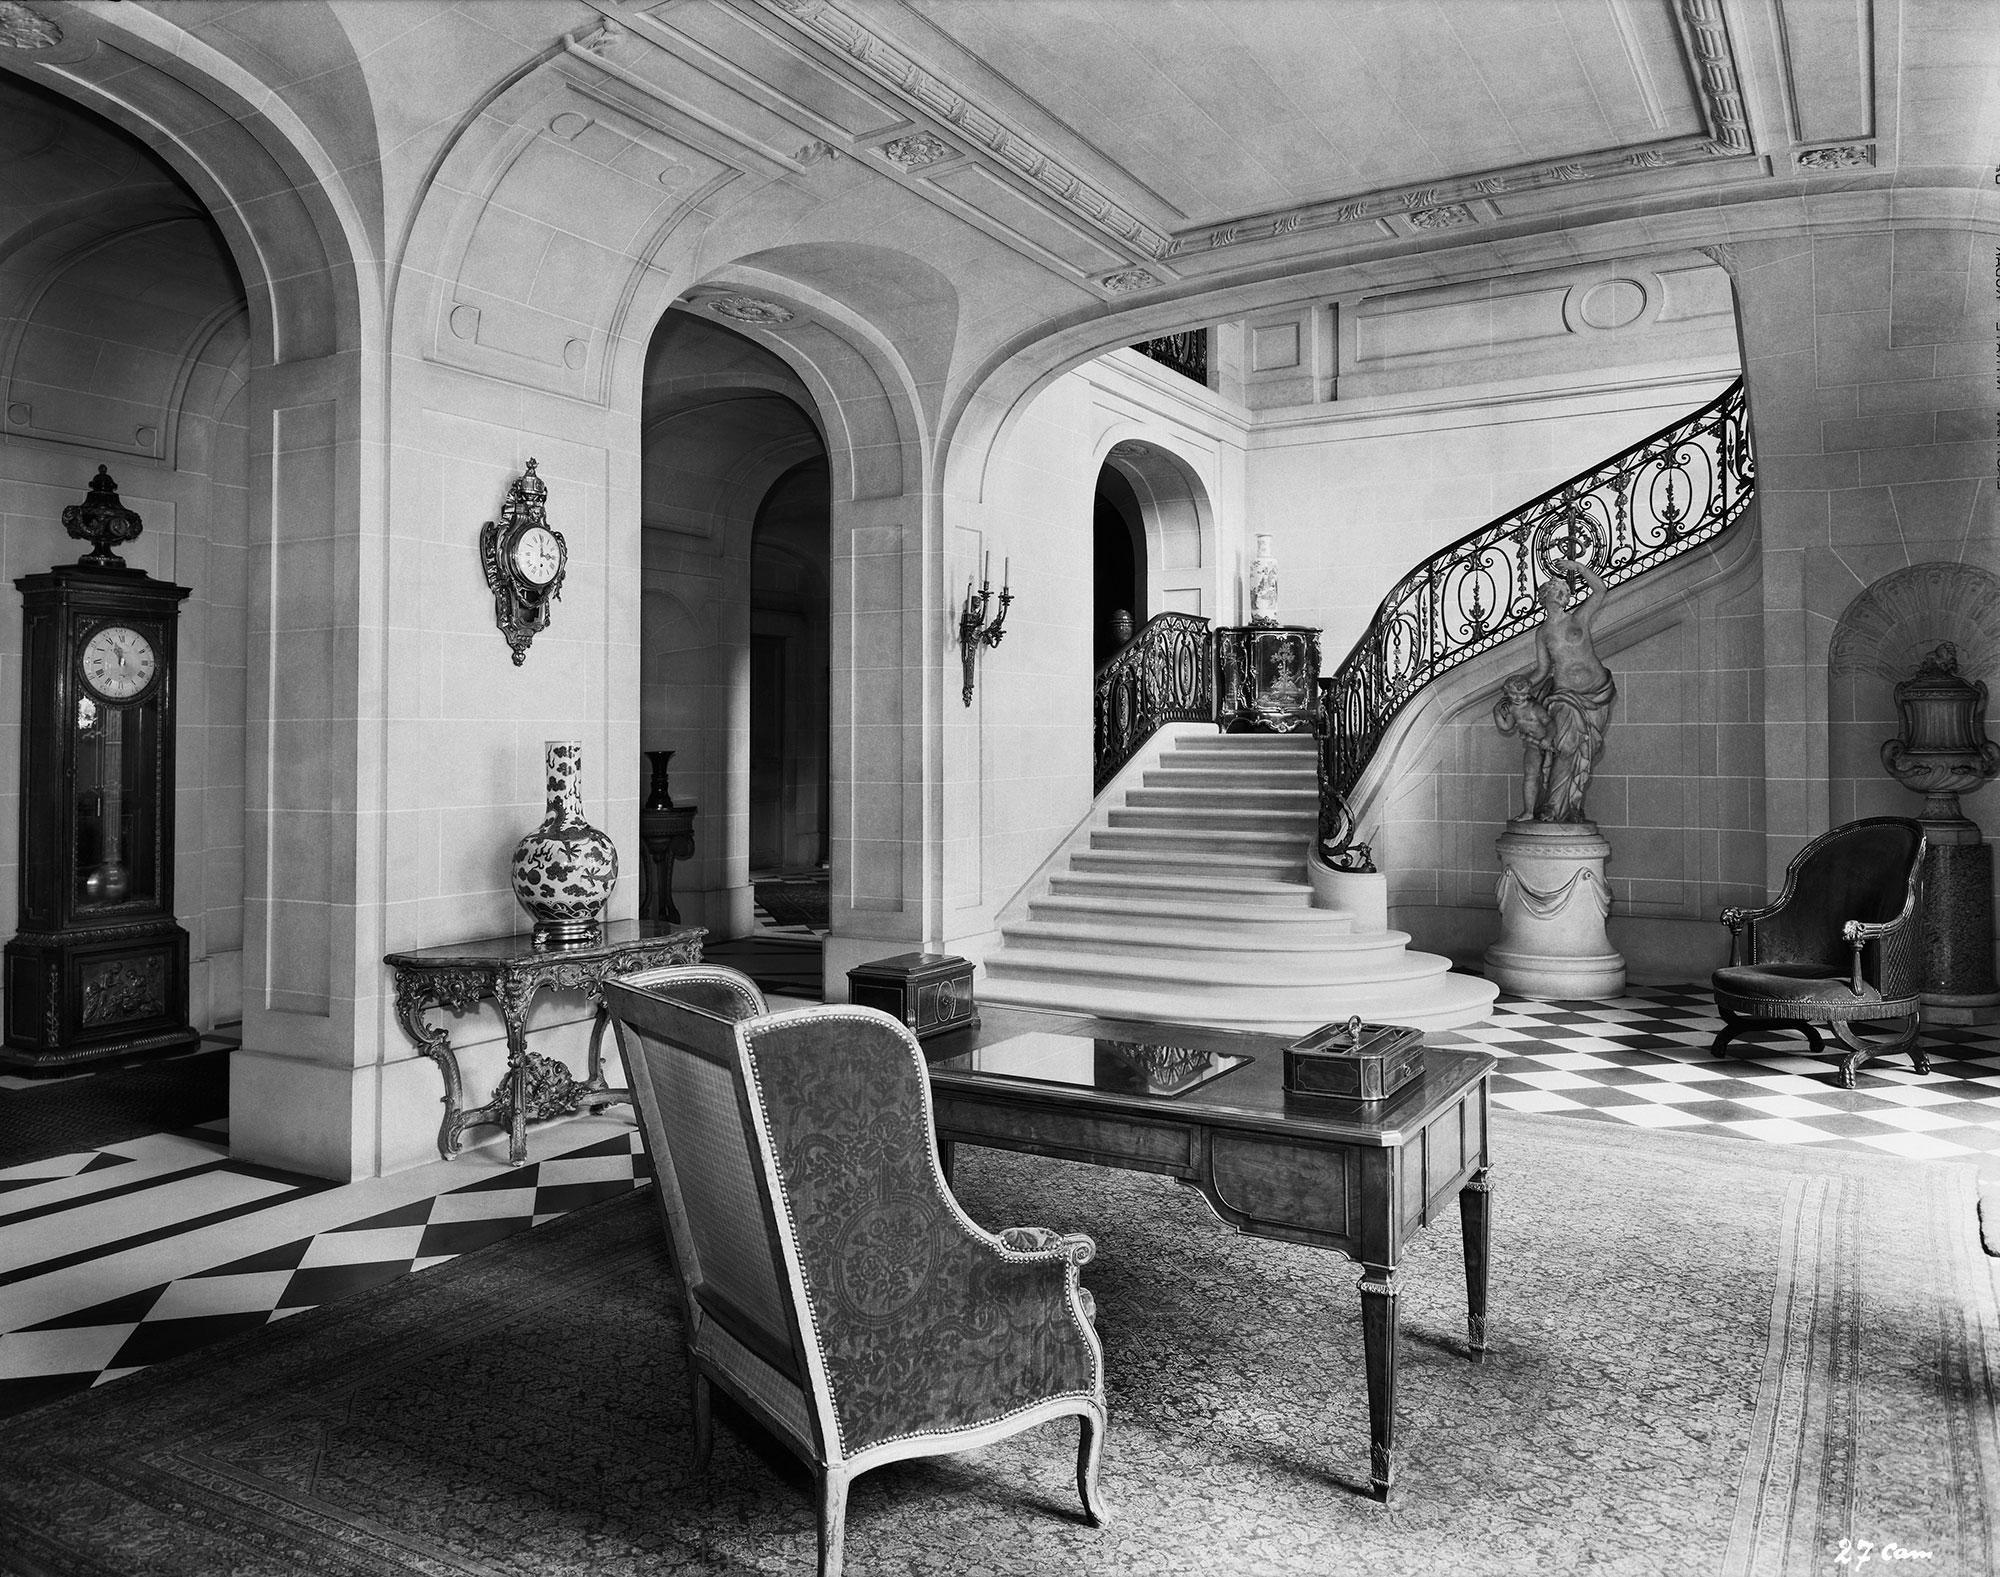 les am nagements salle par salle depuis 1936. Black Bedroom Furniture Sets. Home Design Ideas